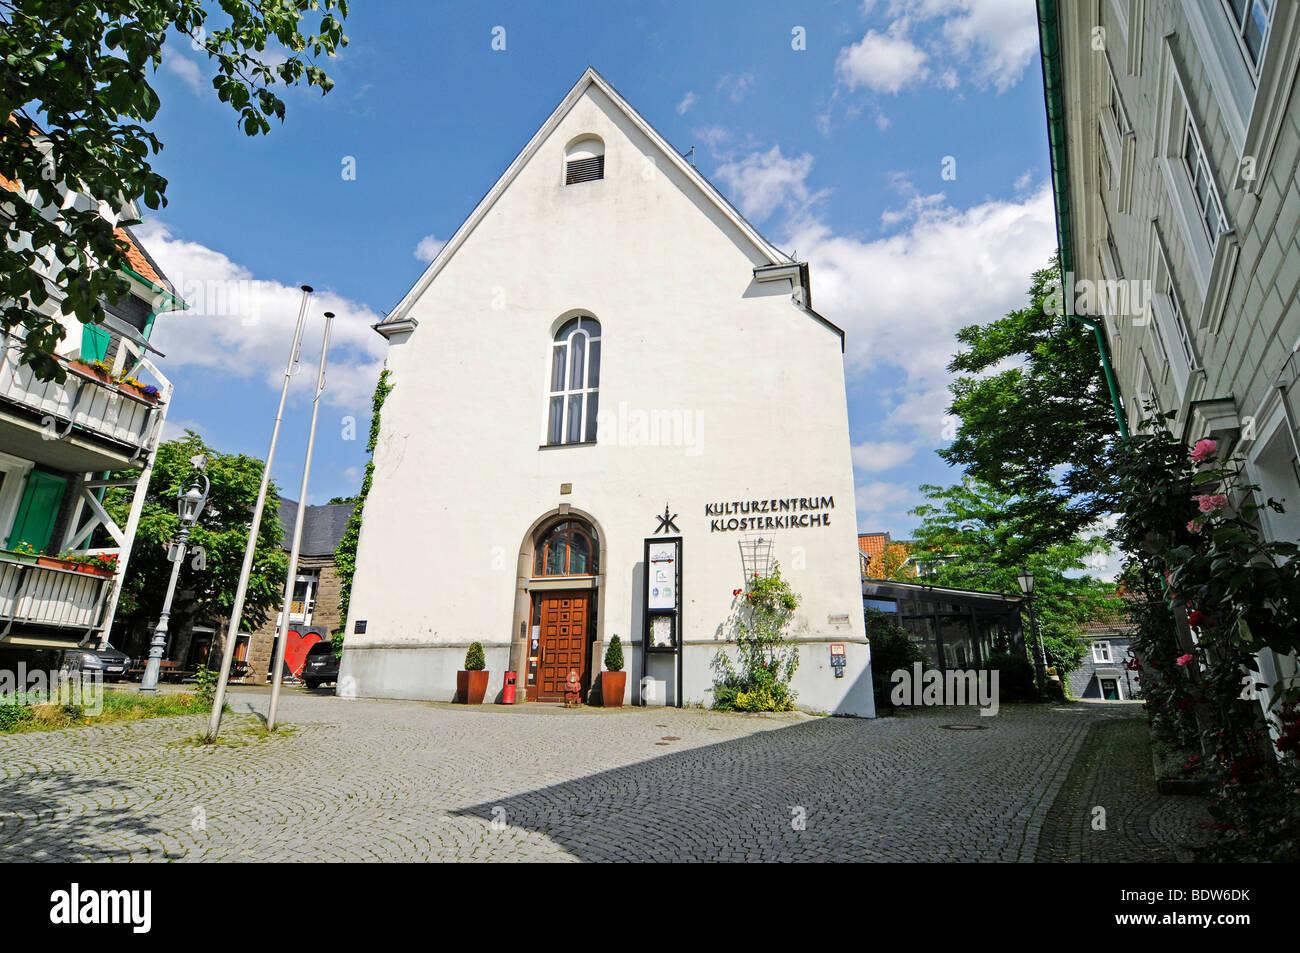 Klosterkirche monastery church, culture centre, Lennep, Remscheid, Bergisches Land area, North Rhine-Westphalia, - Stock Image